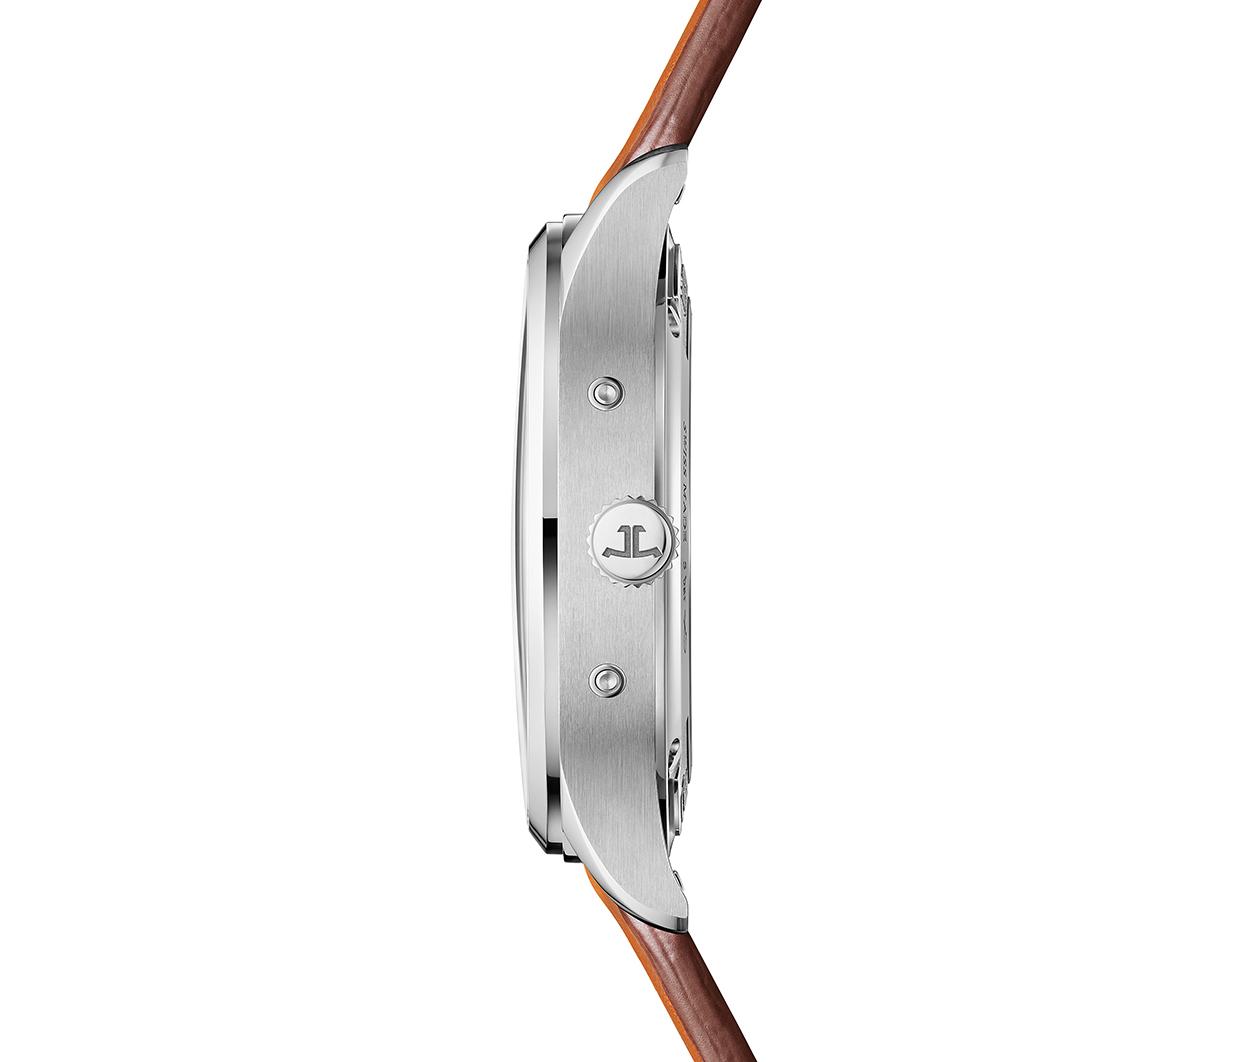 JaegerLeCoultre Master ControlCalendar 4148420 Carousel 2 FINAL